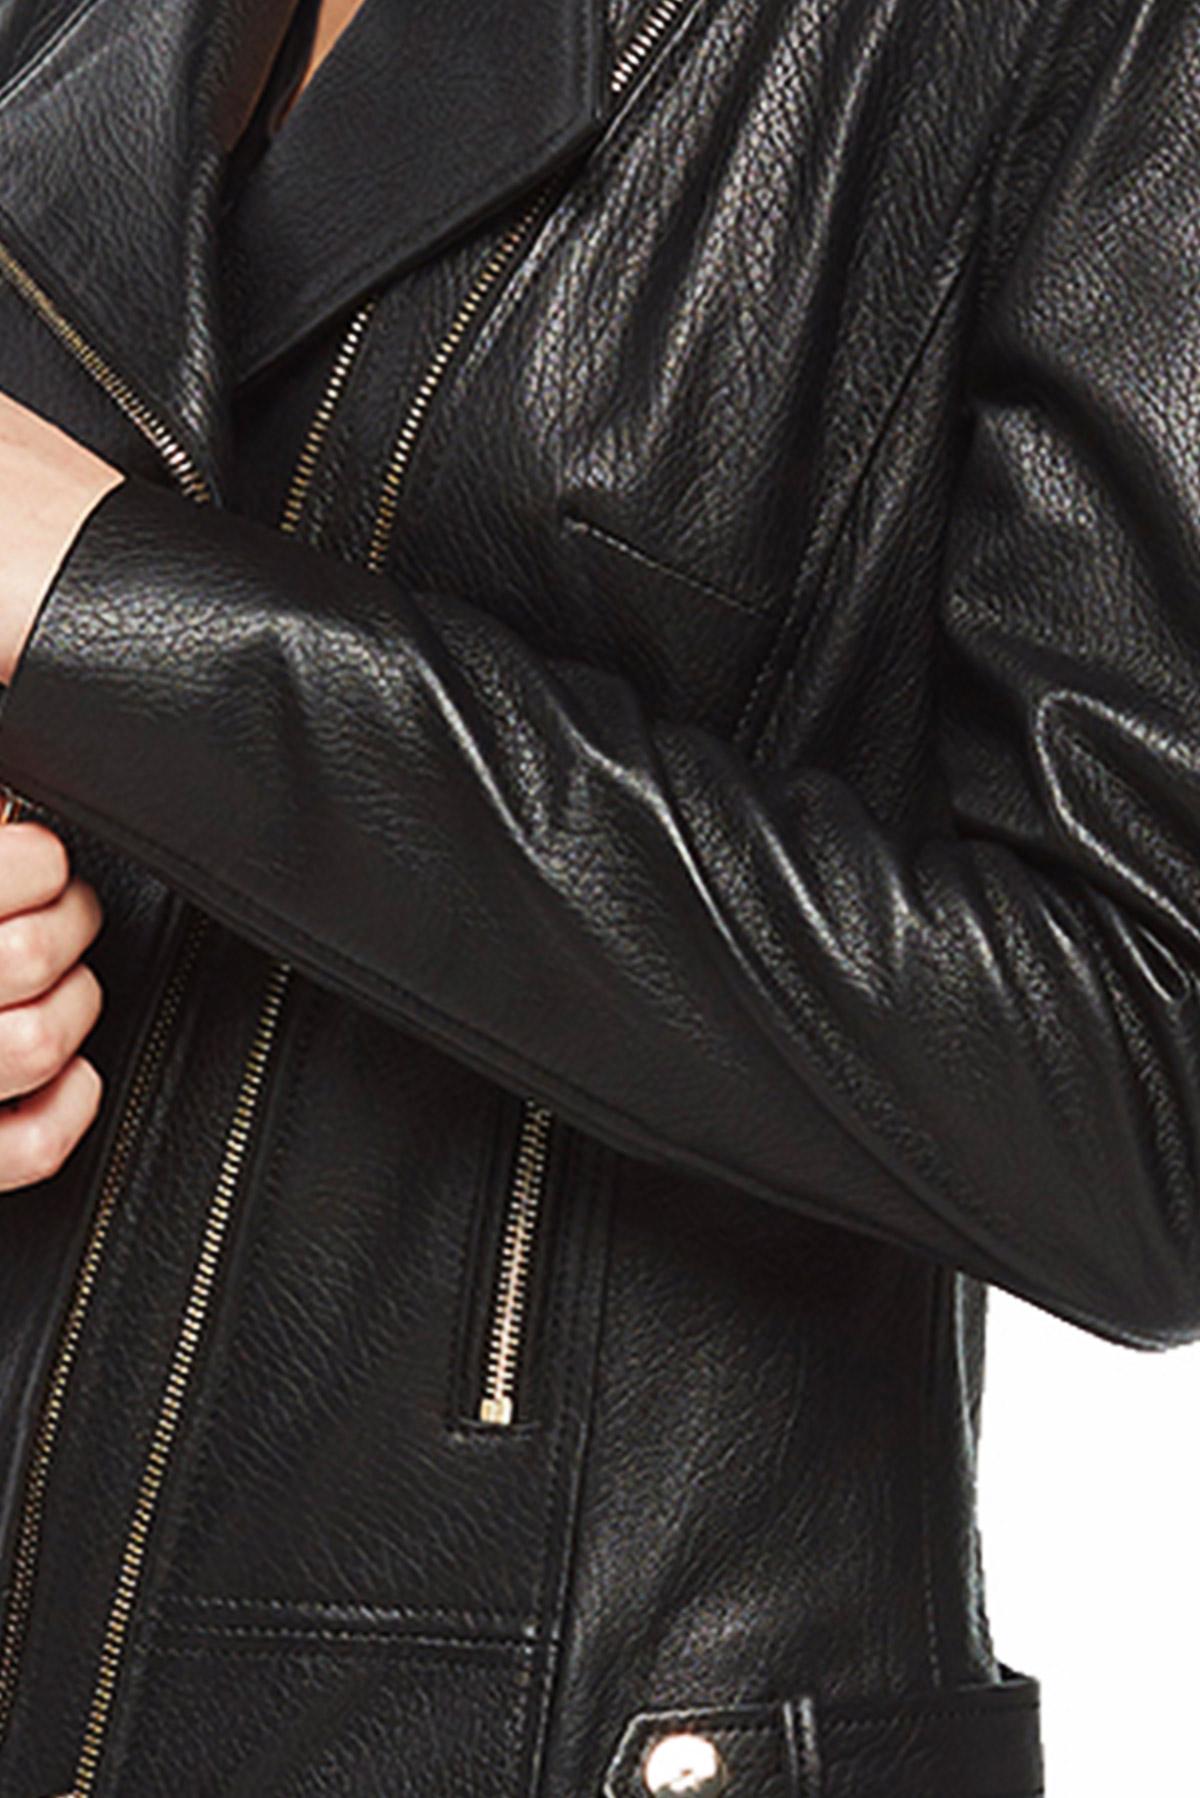 teal leather jacket